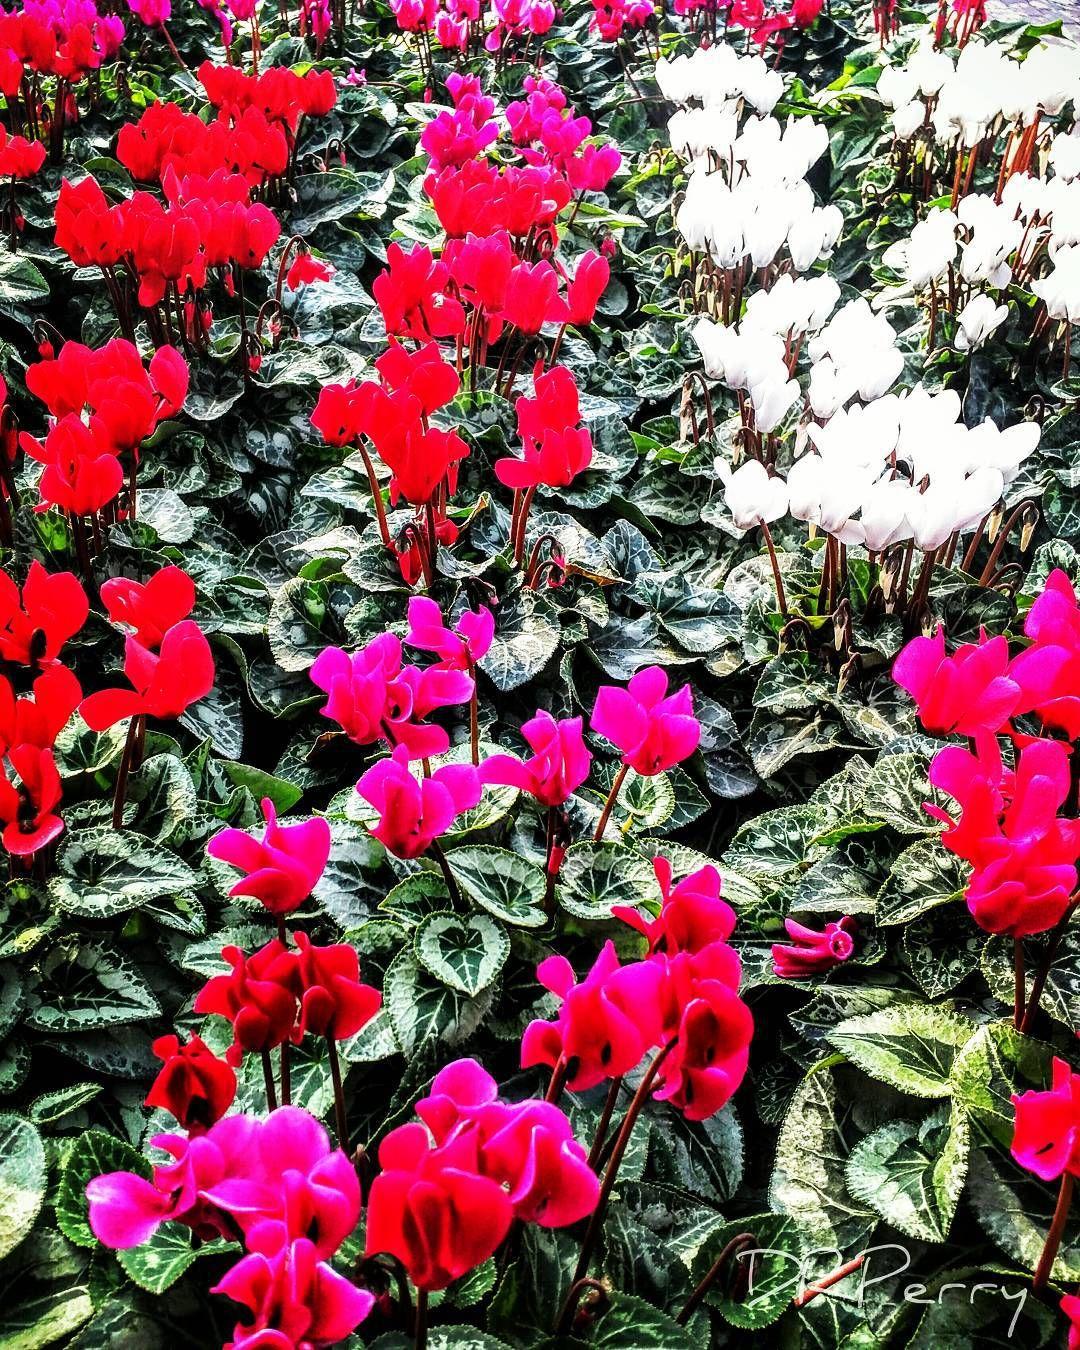 """Cyclamen"" #rome #roma #fiori #lazio #ig_italy #ig_lazio #repostromanticitaly #photobydperry #fb ##wp #flower #photooftheday #discoverglobe  #incredible_italy #noidiroma #italia #italy"